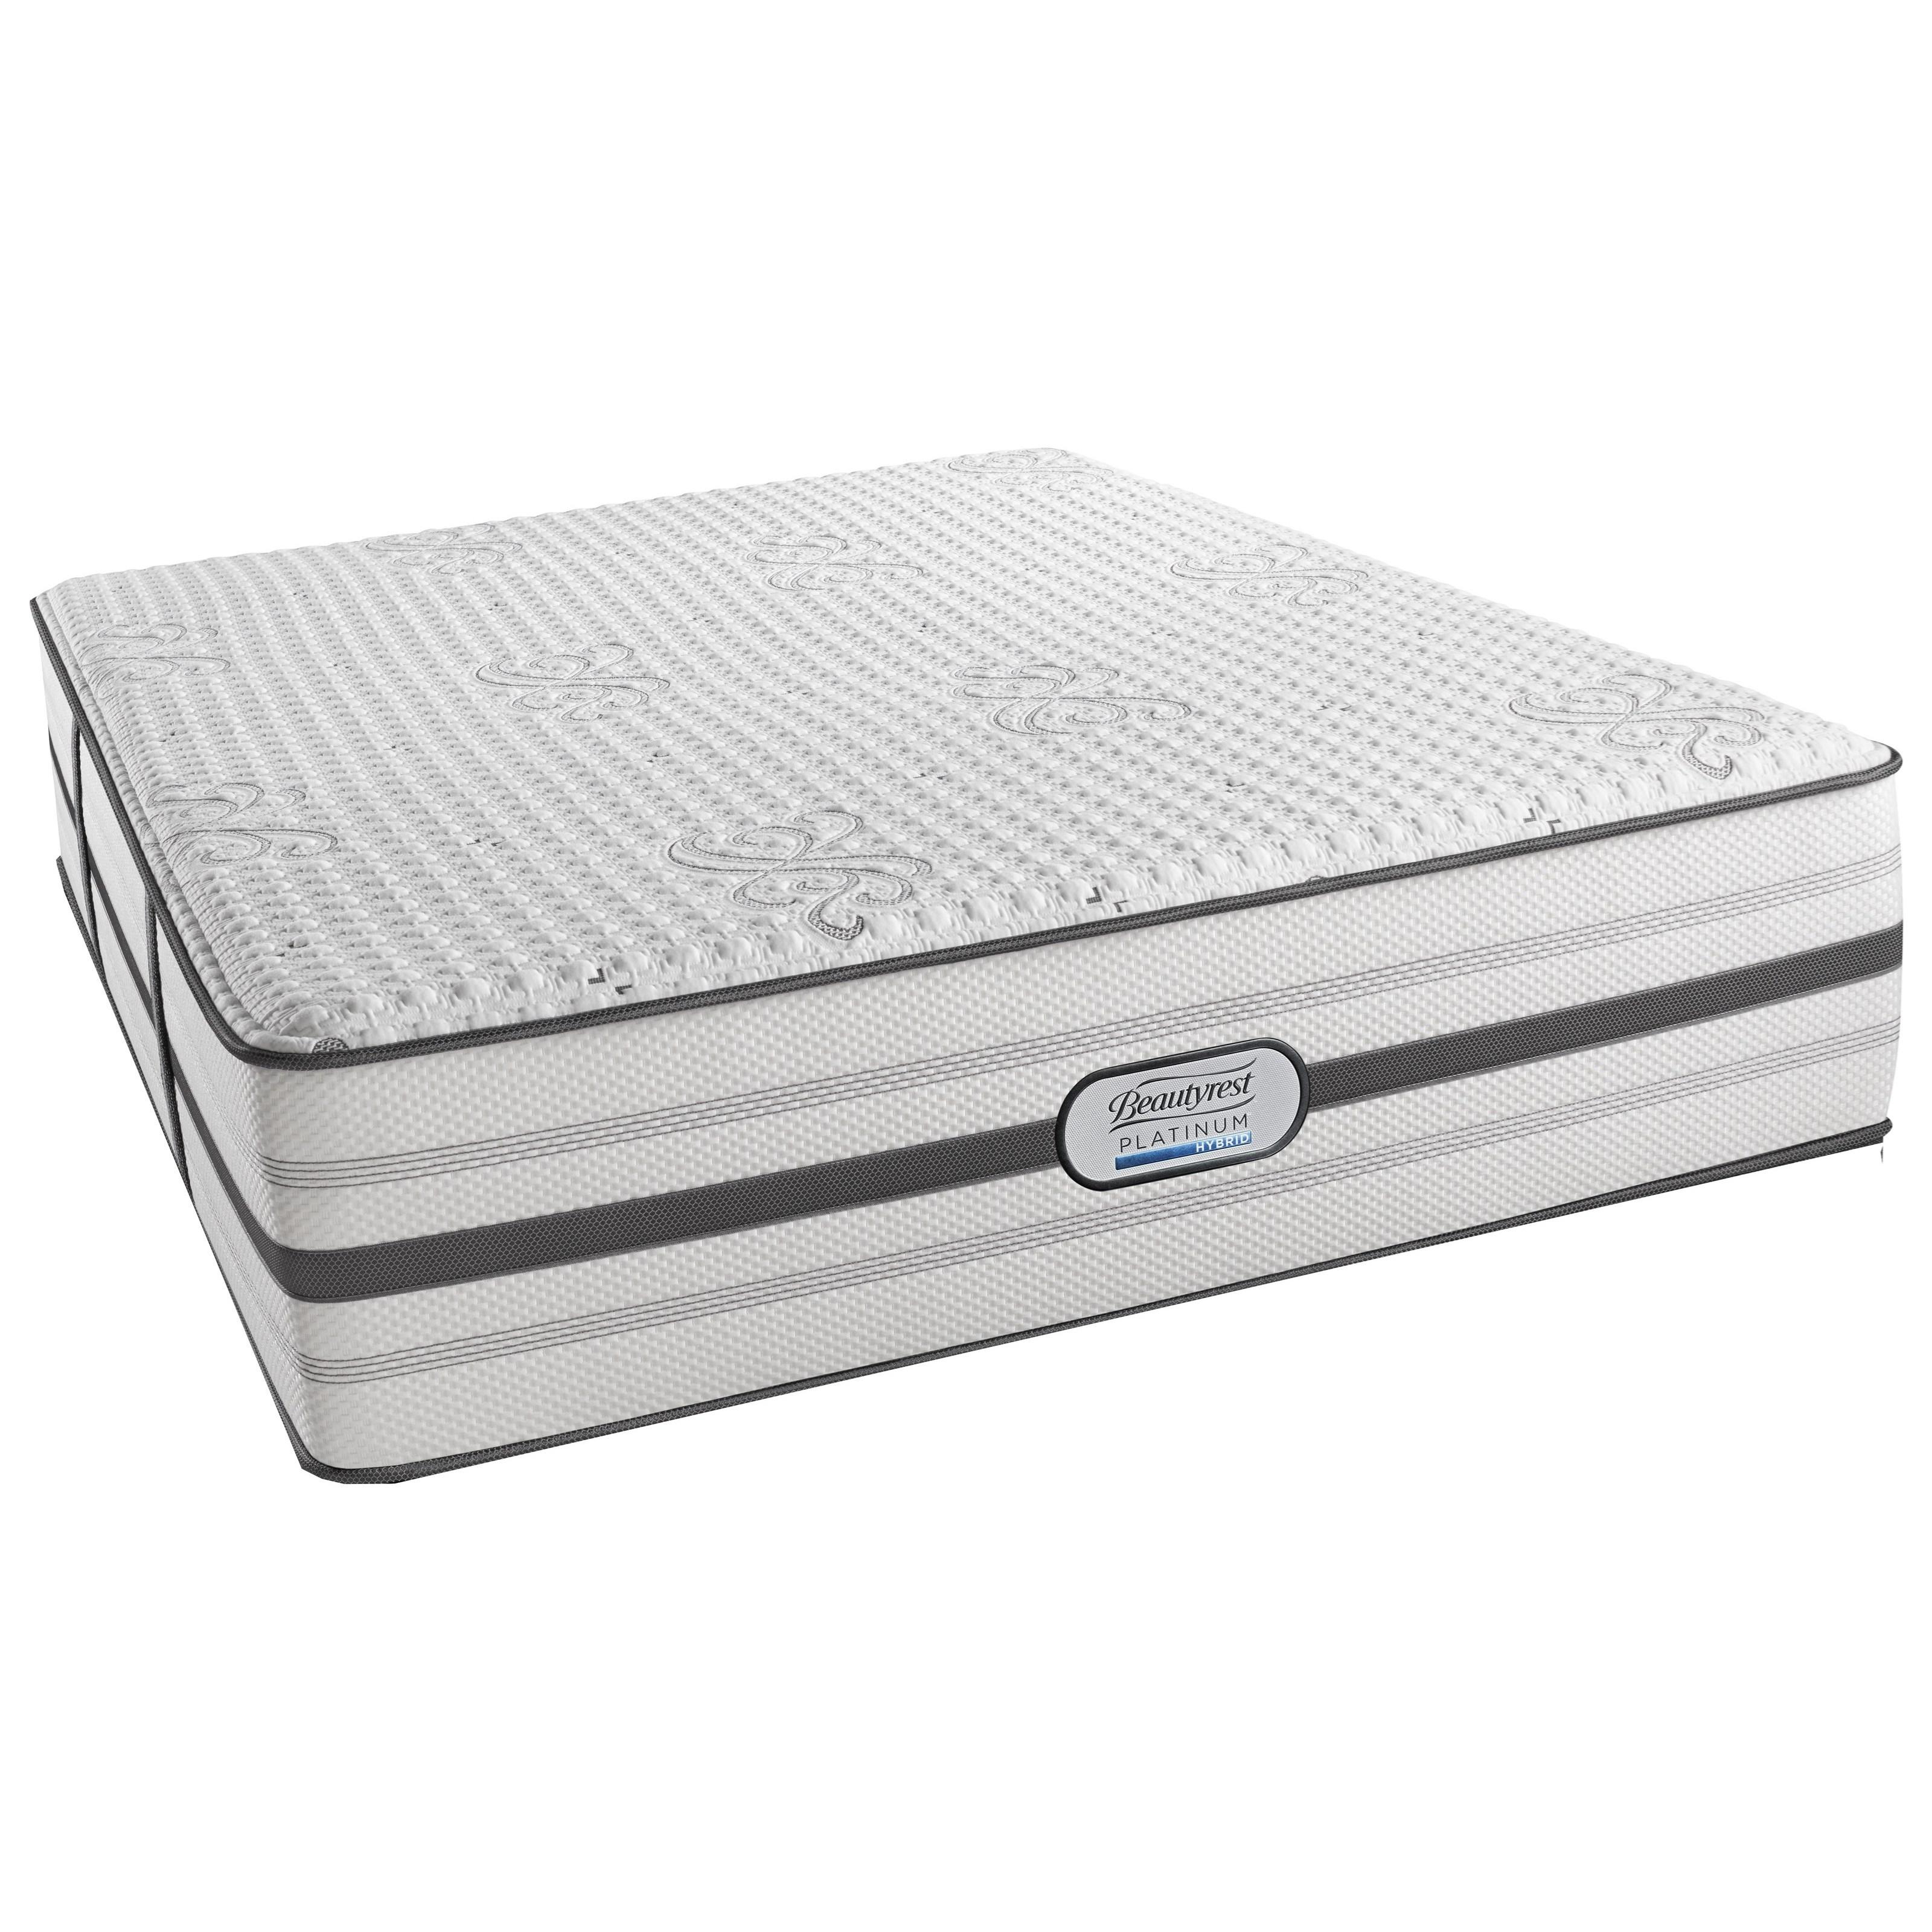 Beautyrest Platinum Hybrid Quinn Twin XL Ultra Plush Adjustable Set - Item Number: BRHLV4UPL-TXL+SM3-TXL